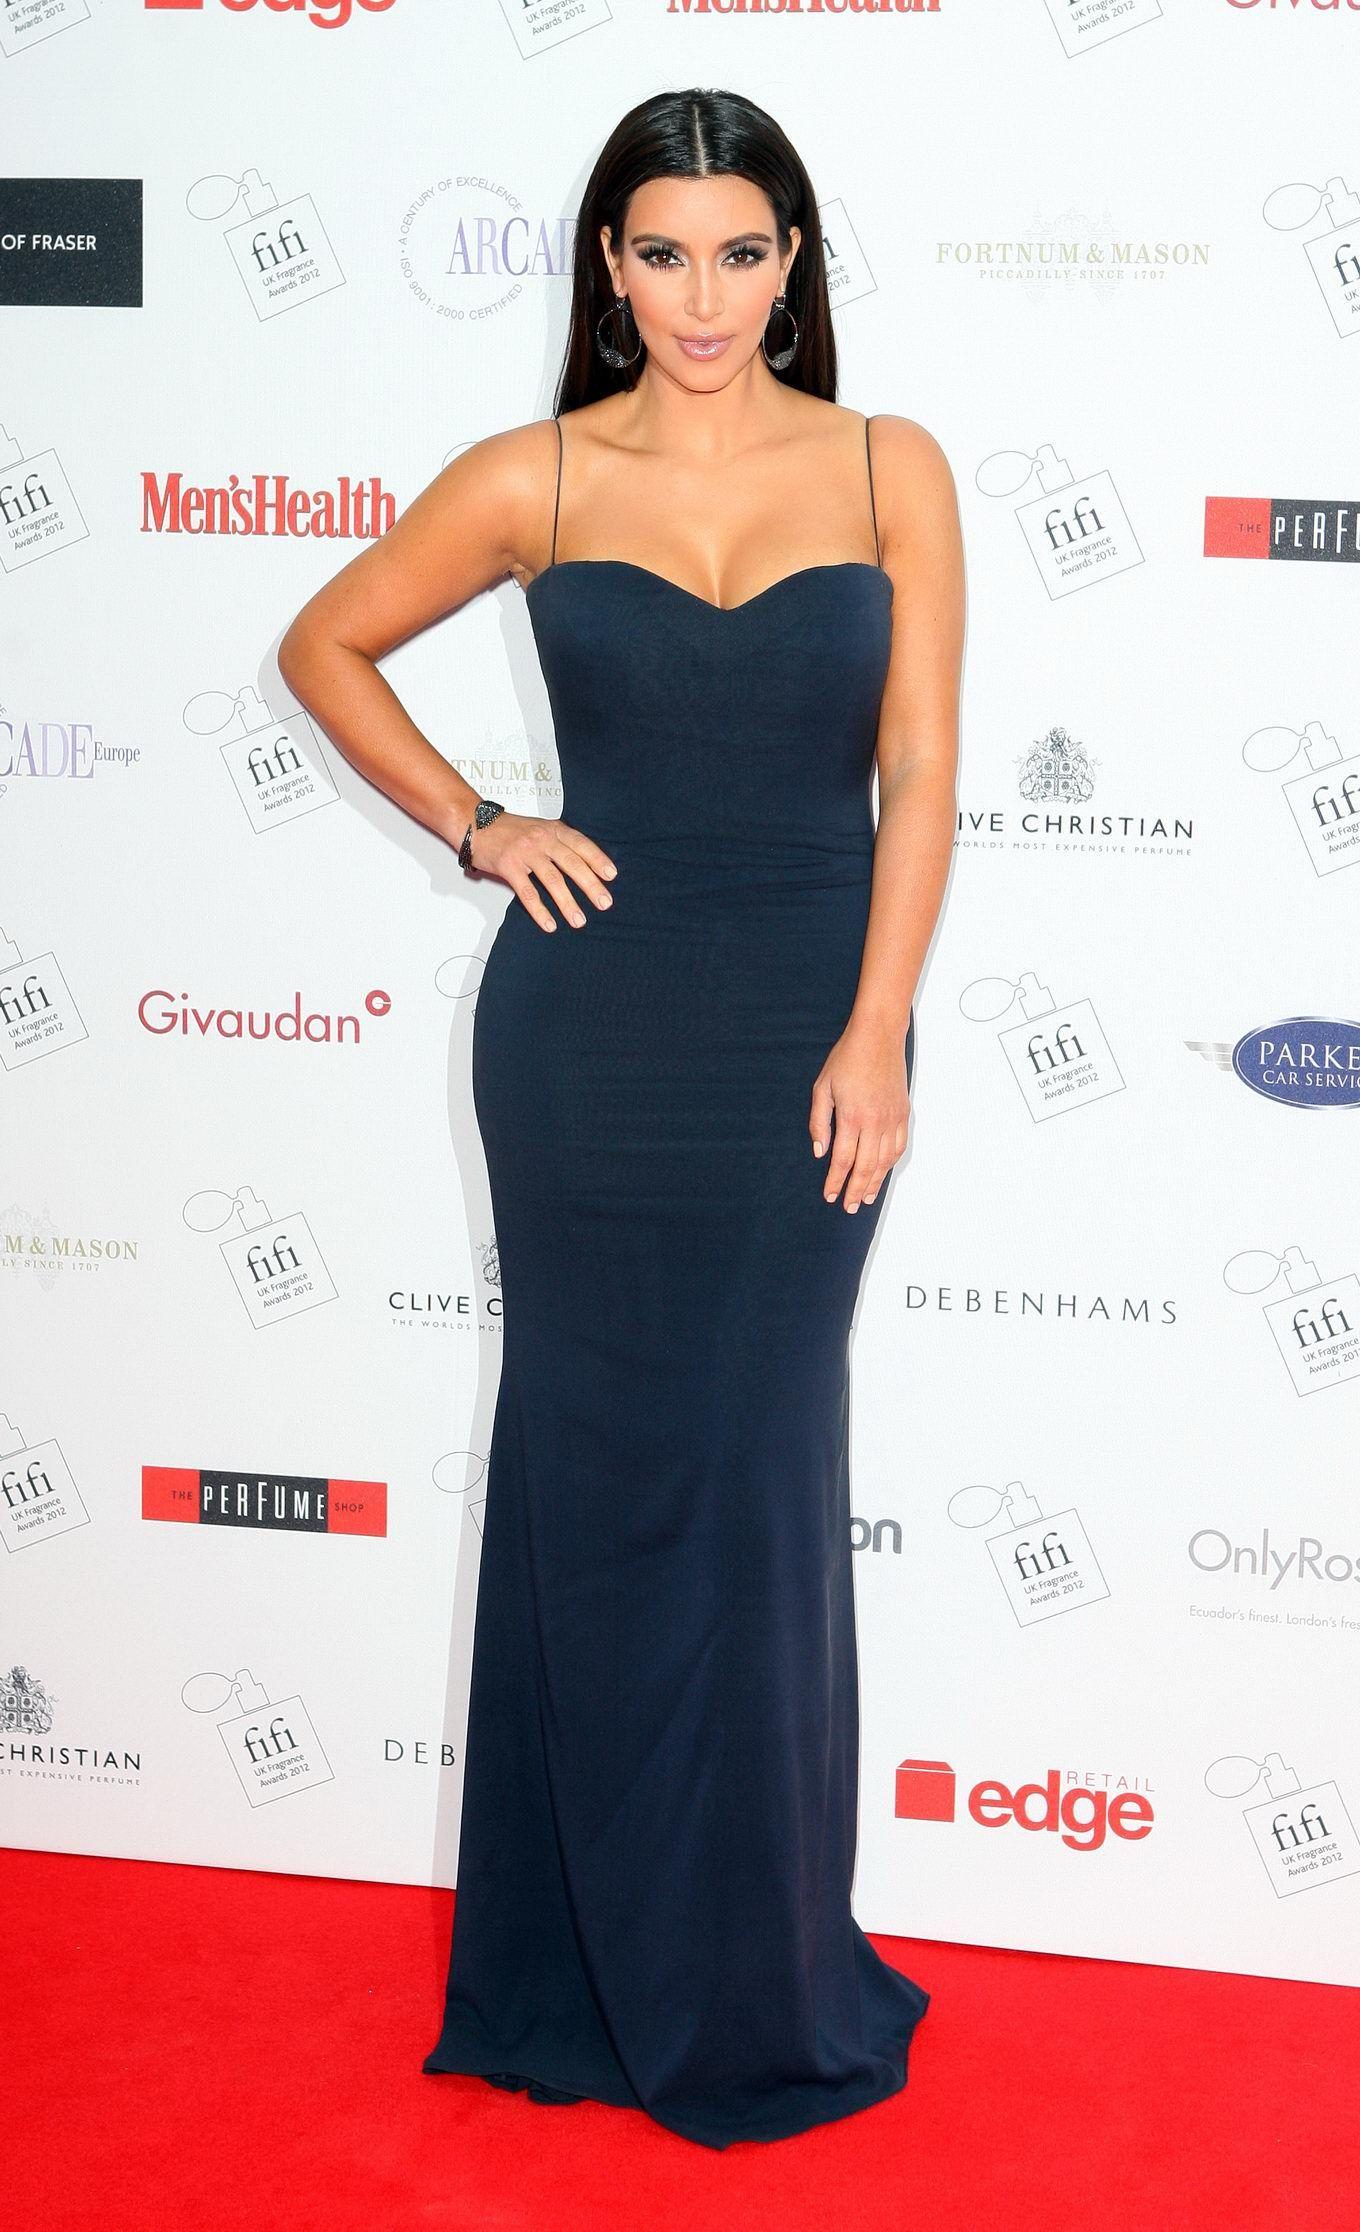 Kim Kardashian – at FiFi UK Fragrance Awards in London 02.09.12 ...